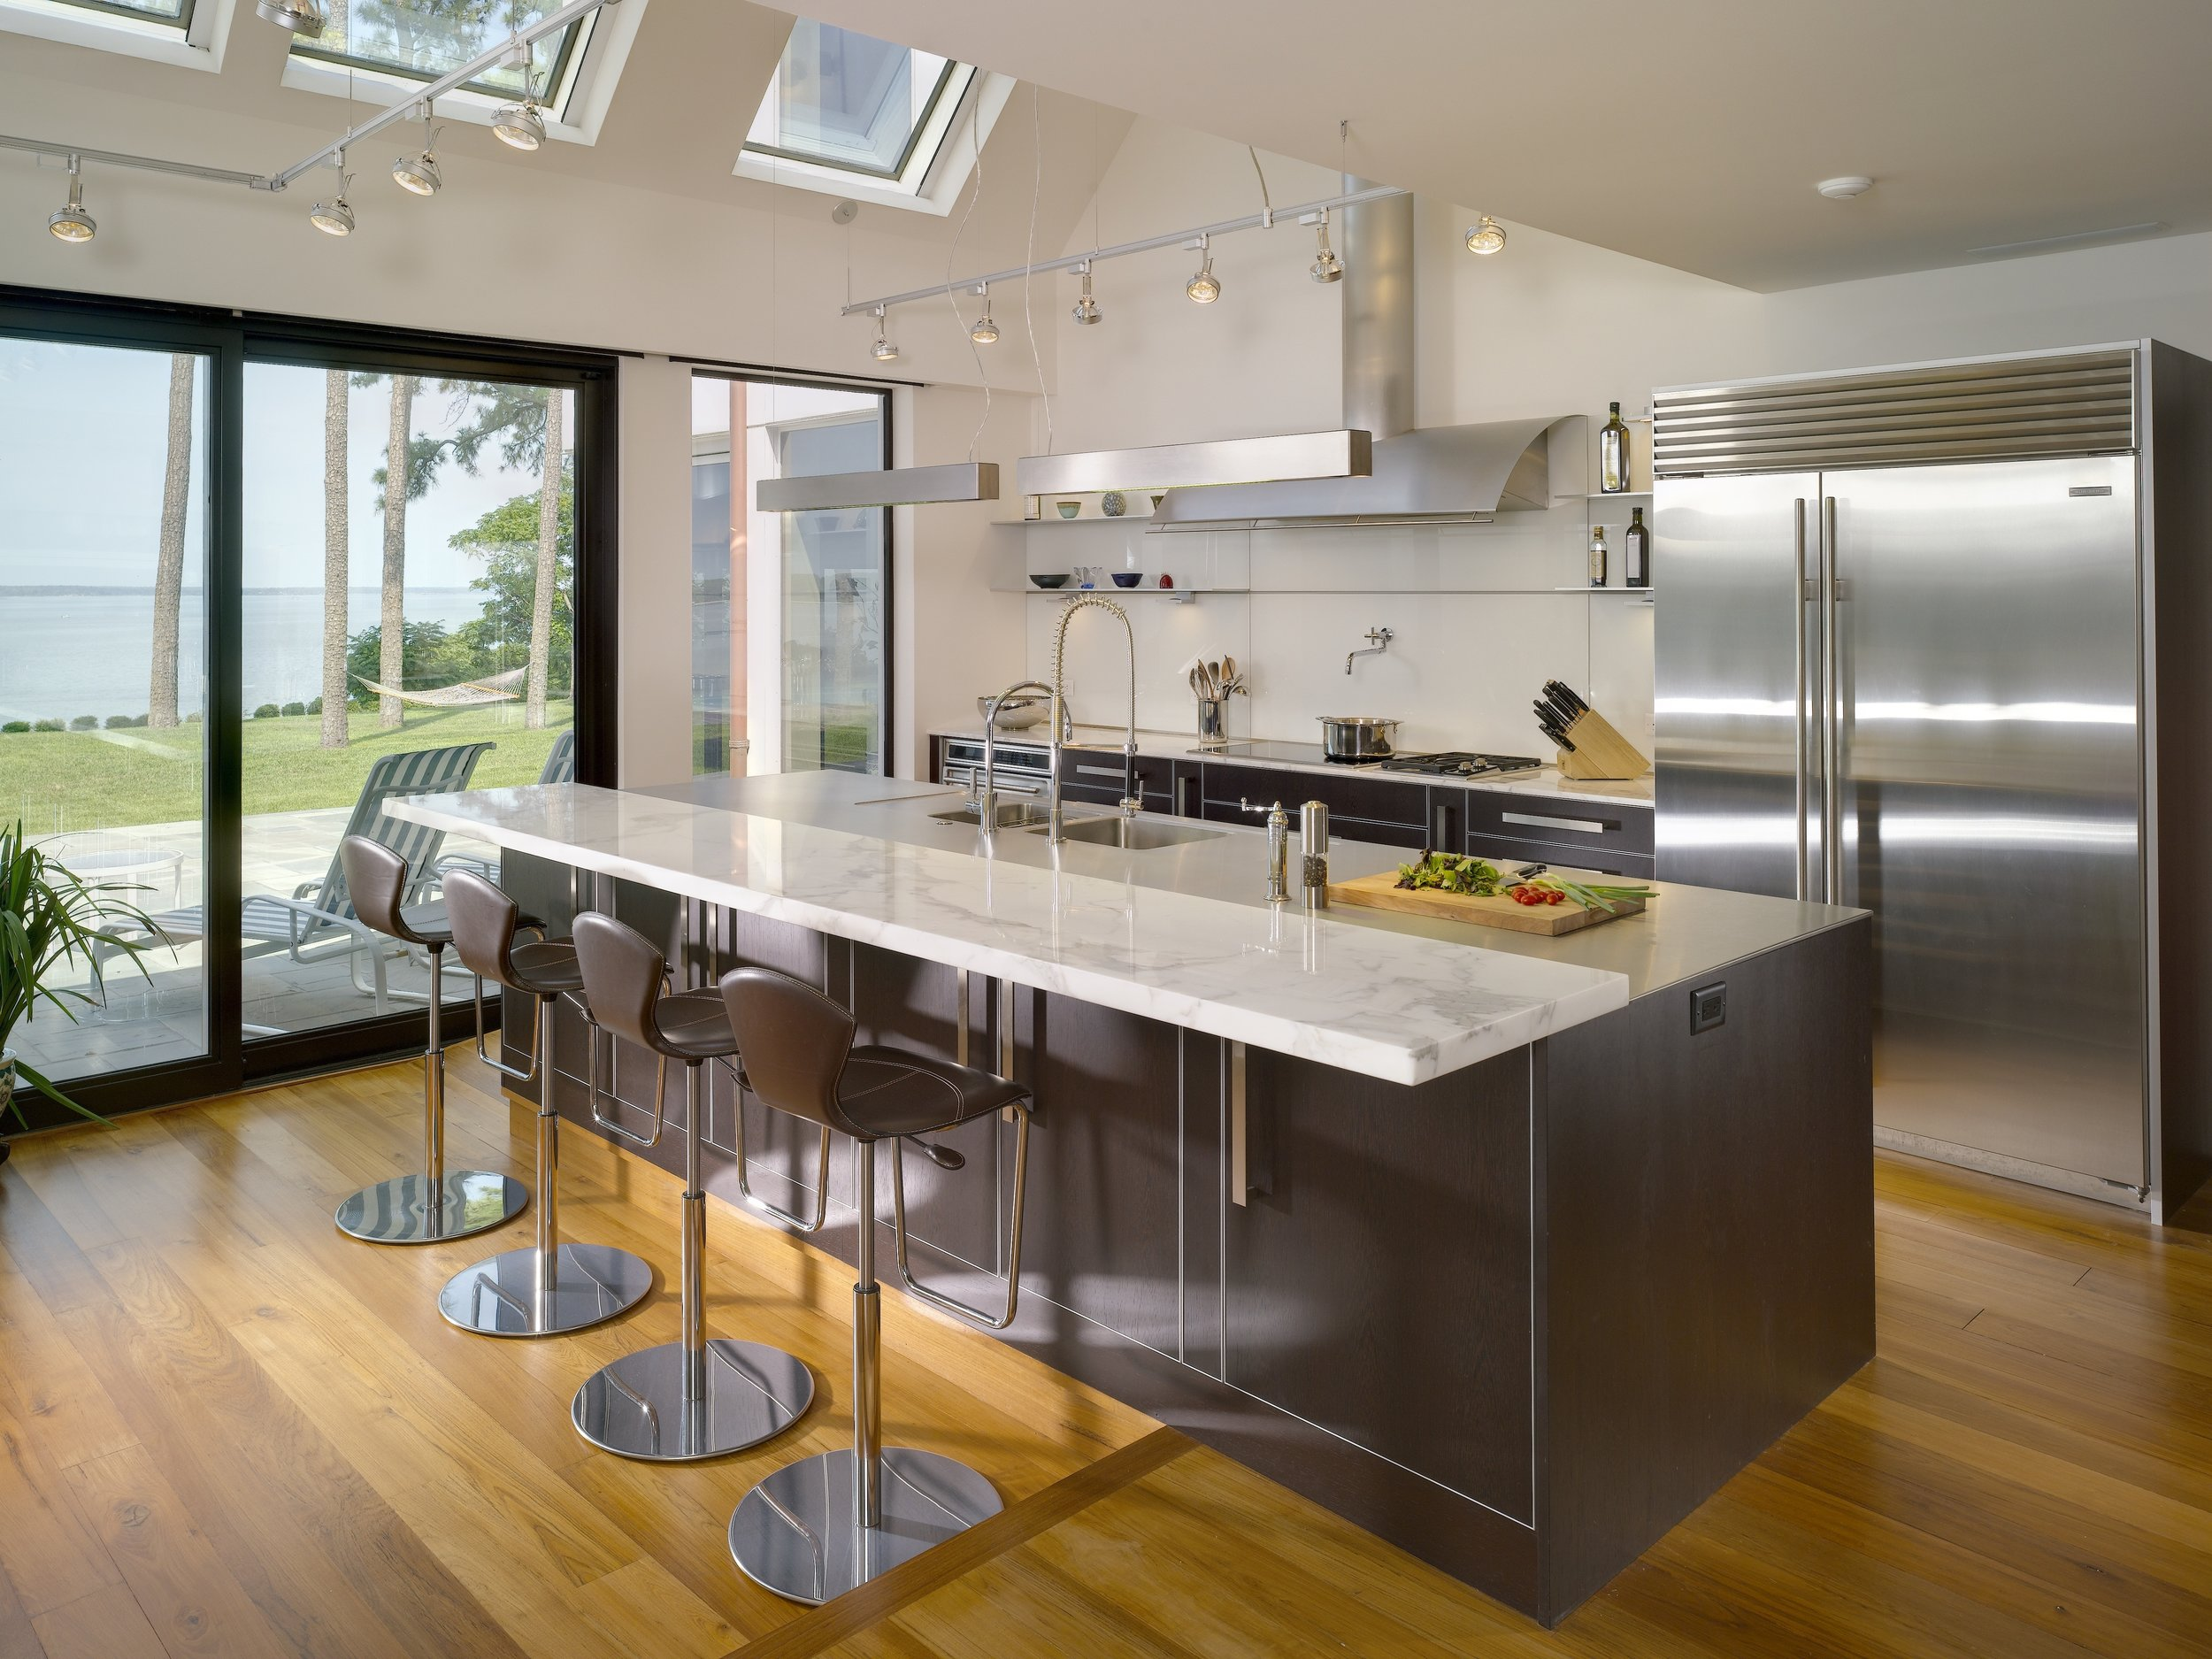 kitchen_bar copy.jpg